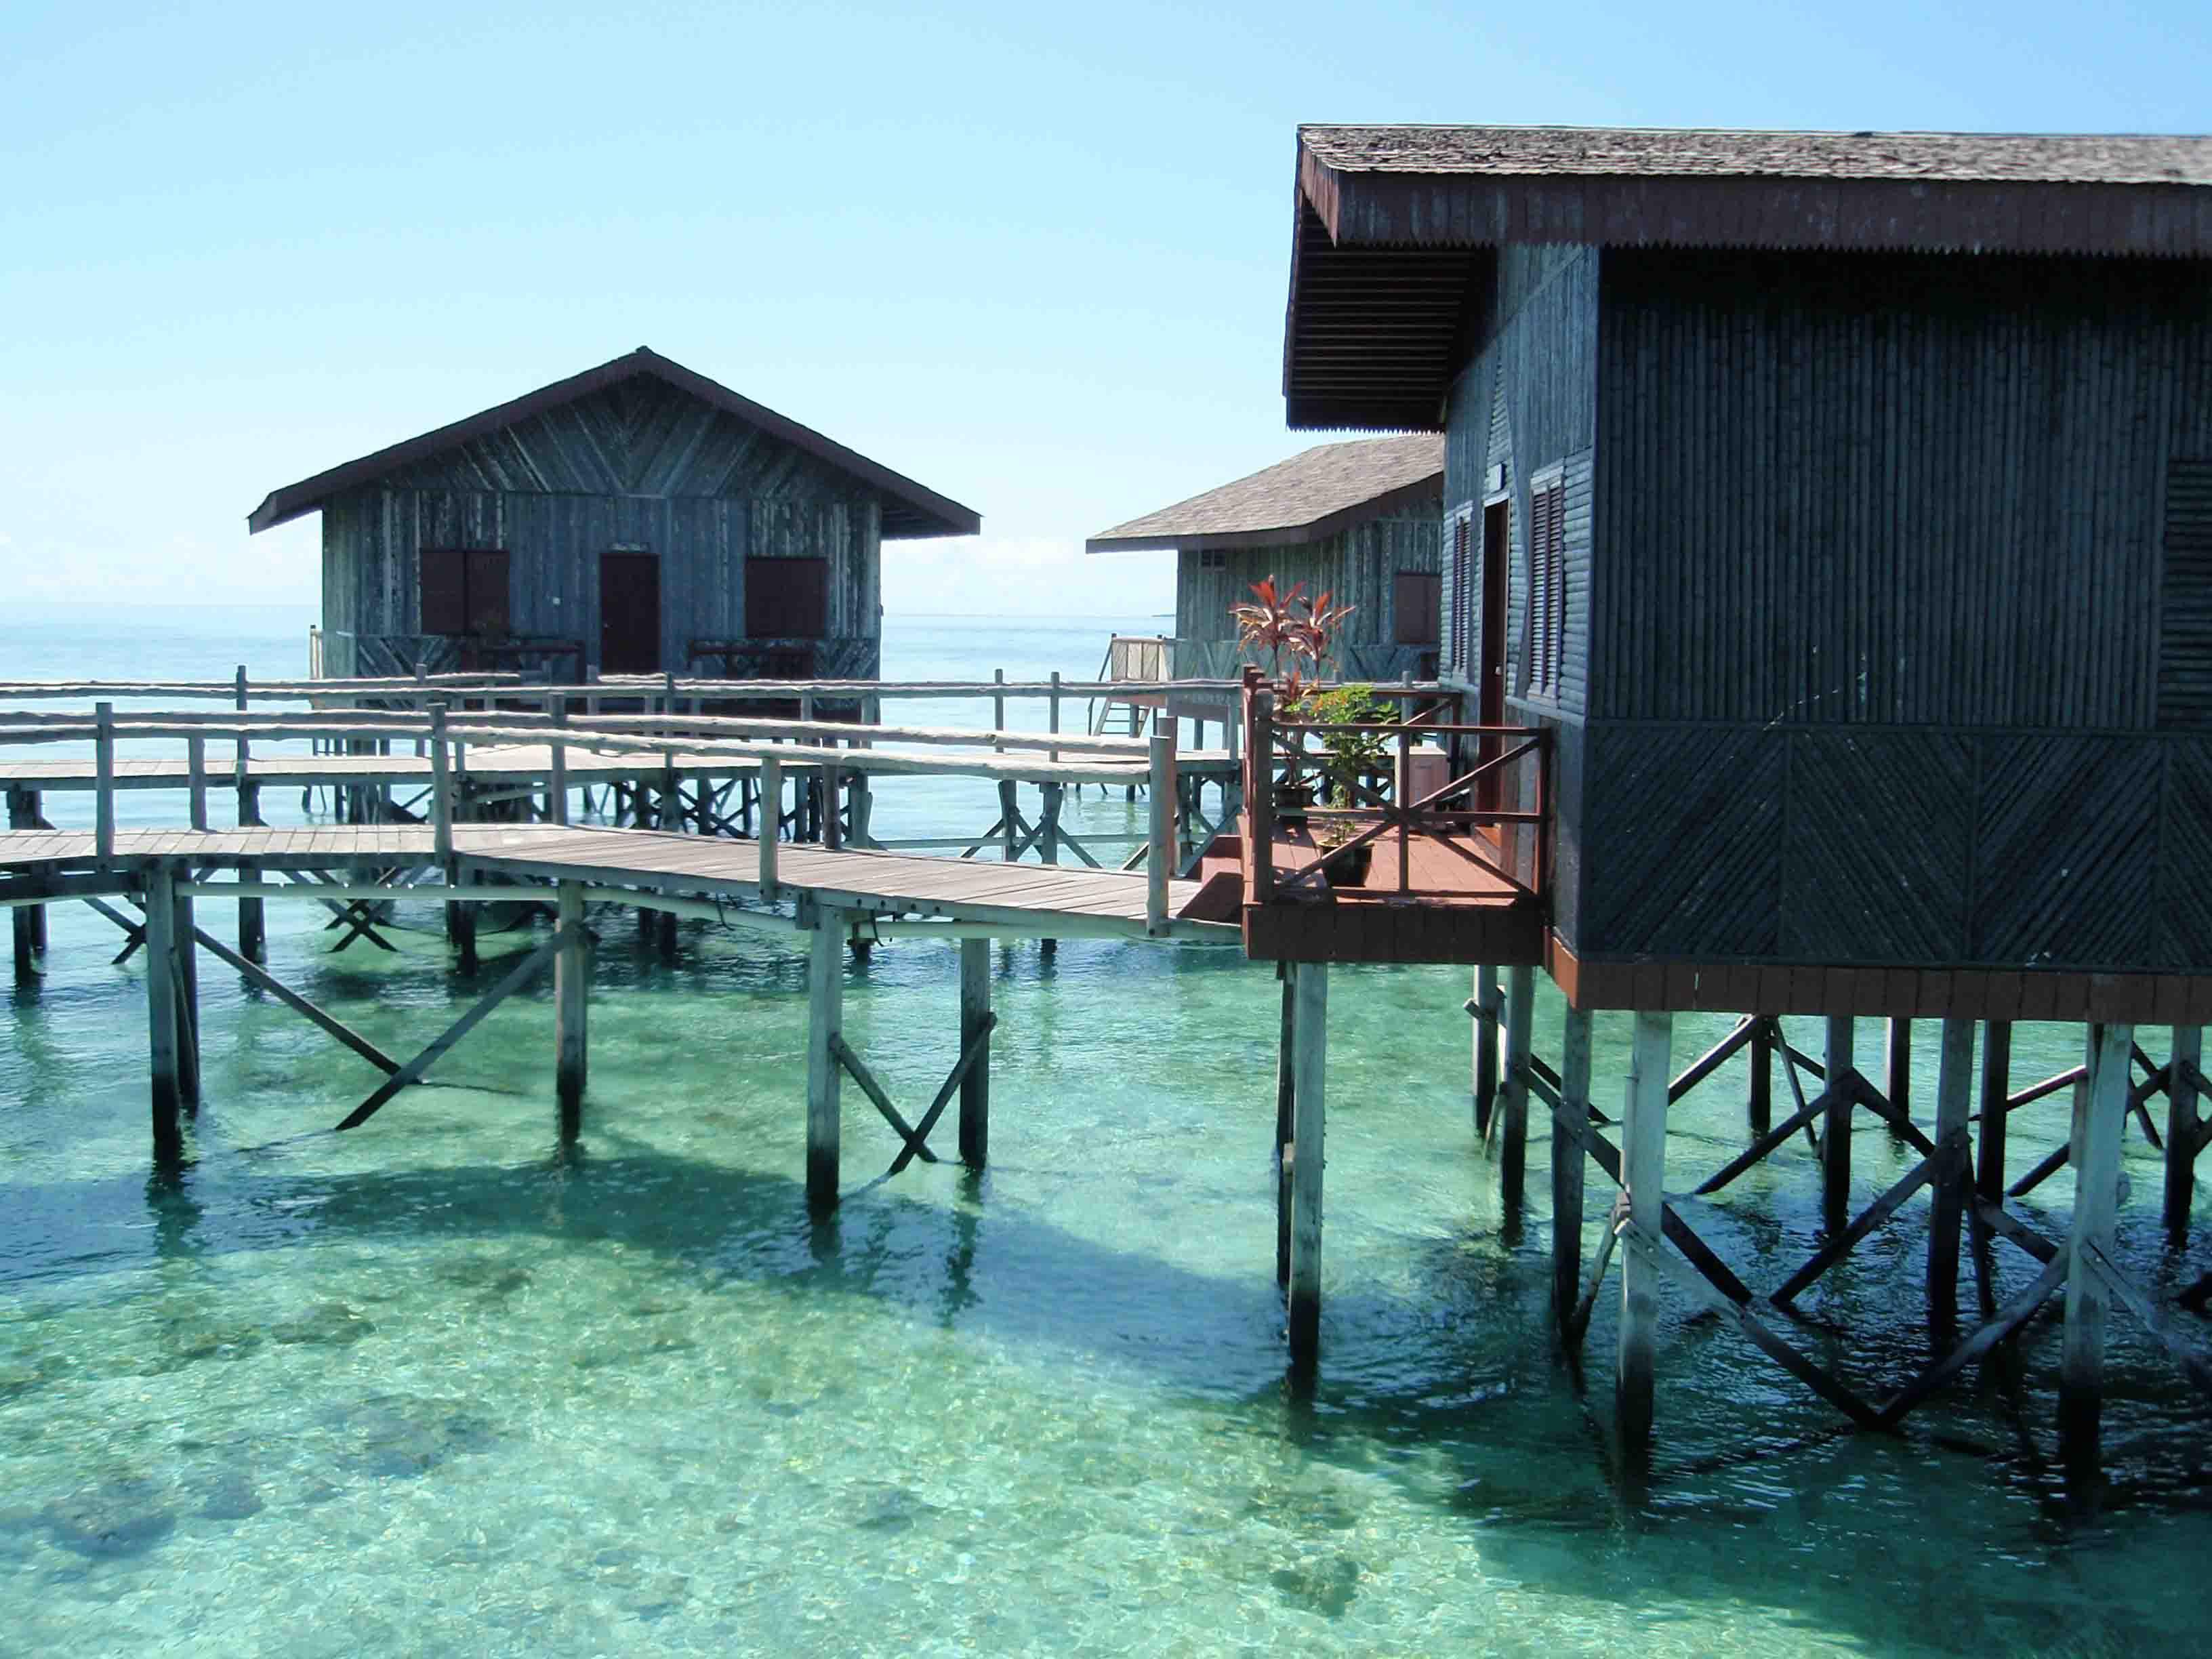 Image from Pom Pom Island Resort & Spa